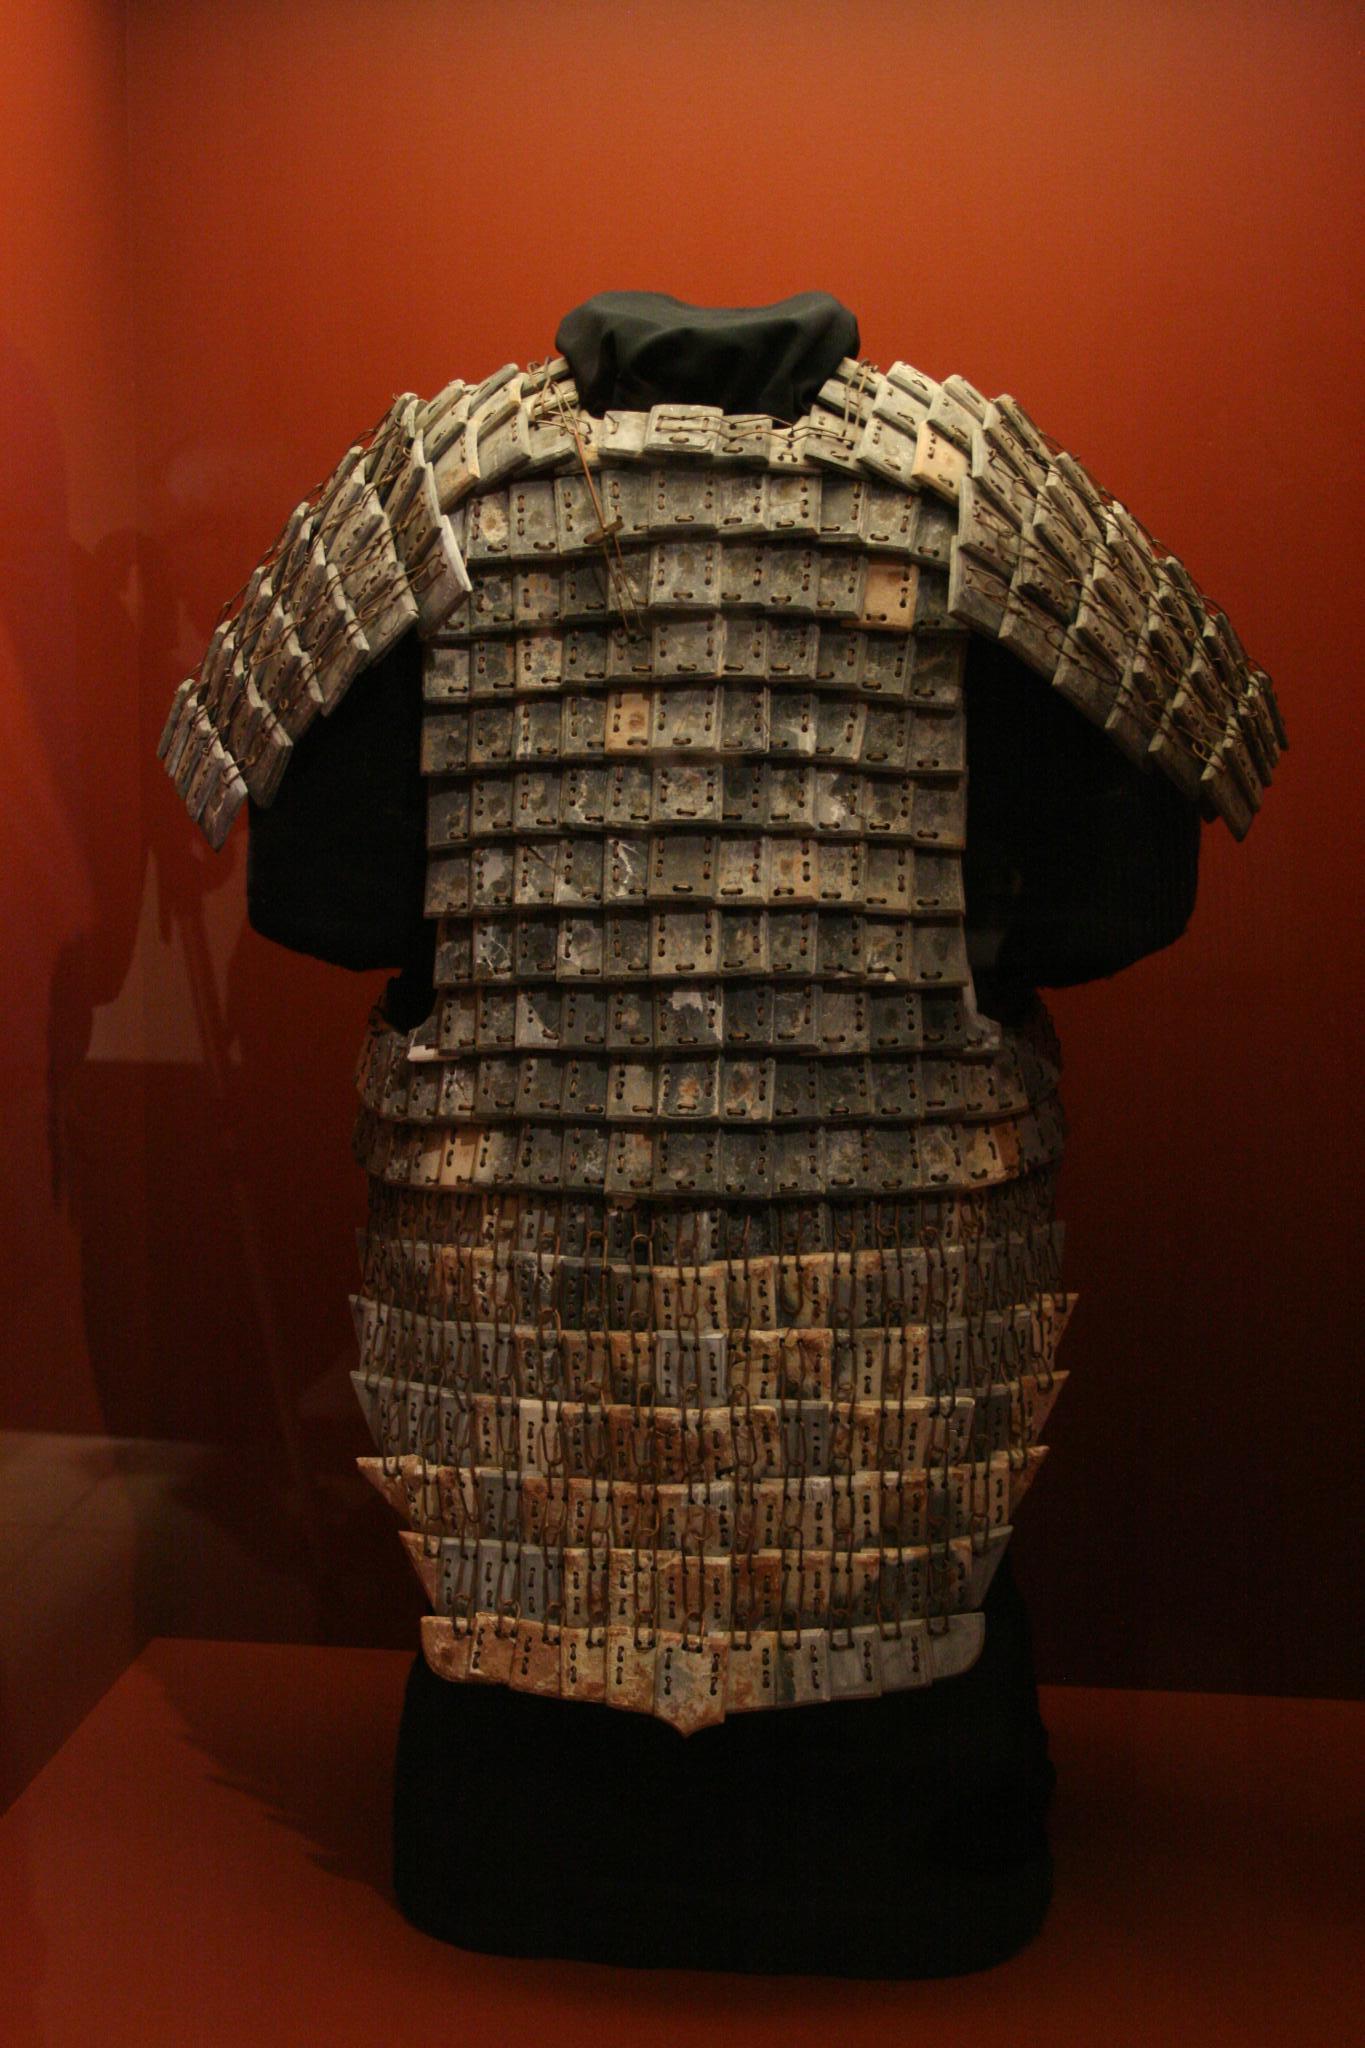 Terracotta Army of Emperor Qin. Stone Armor. Photo Attributes: ShashiBellamkonda